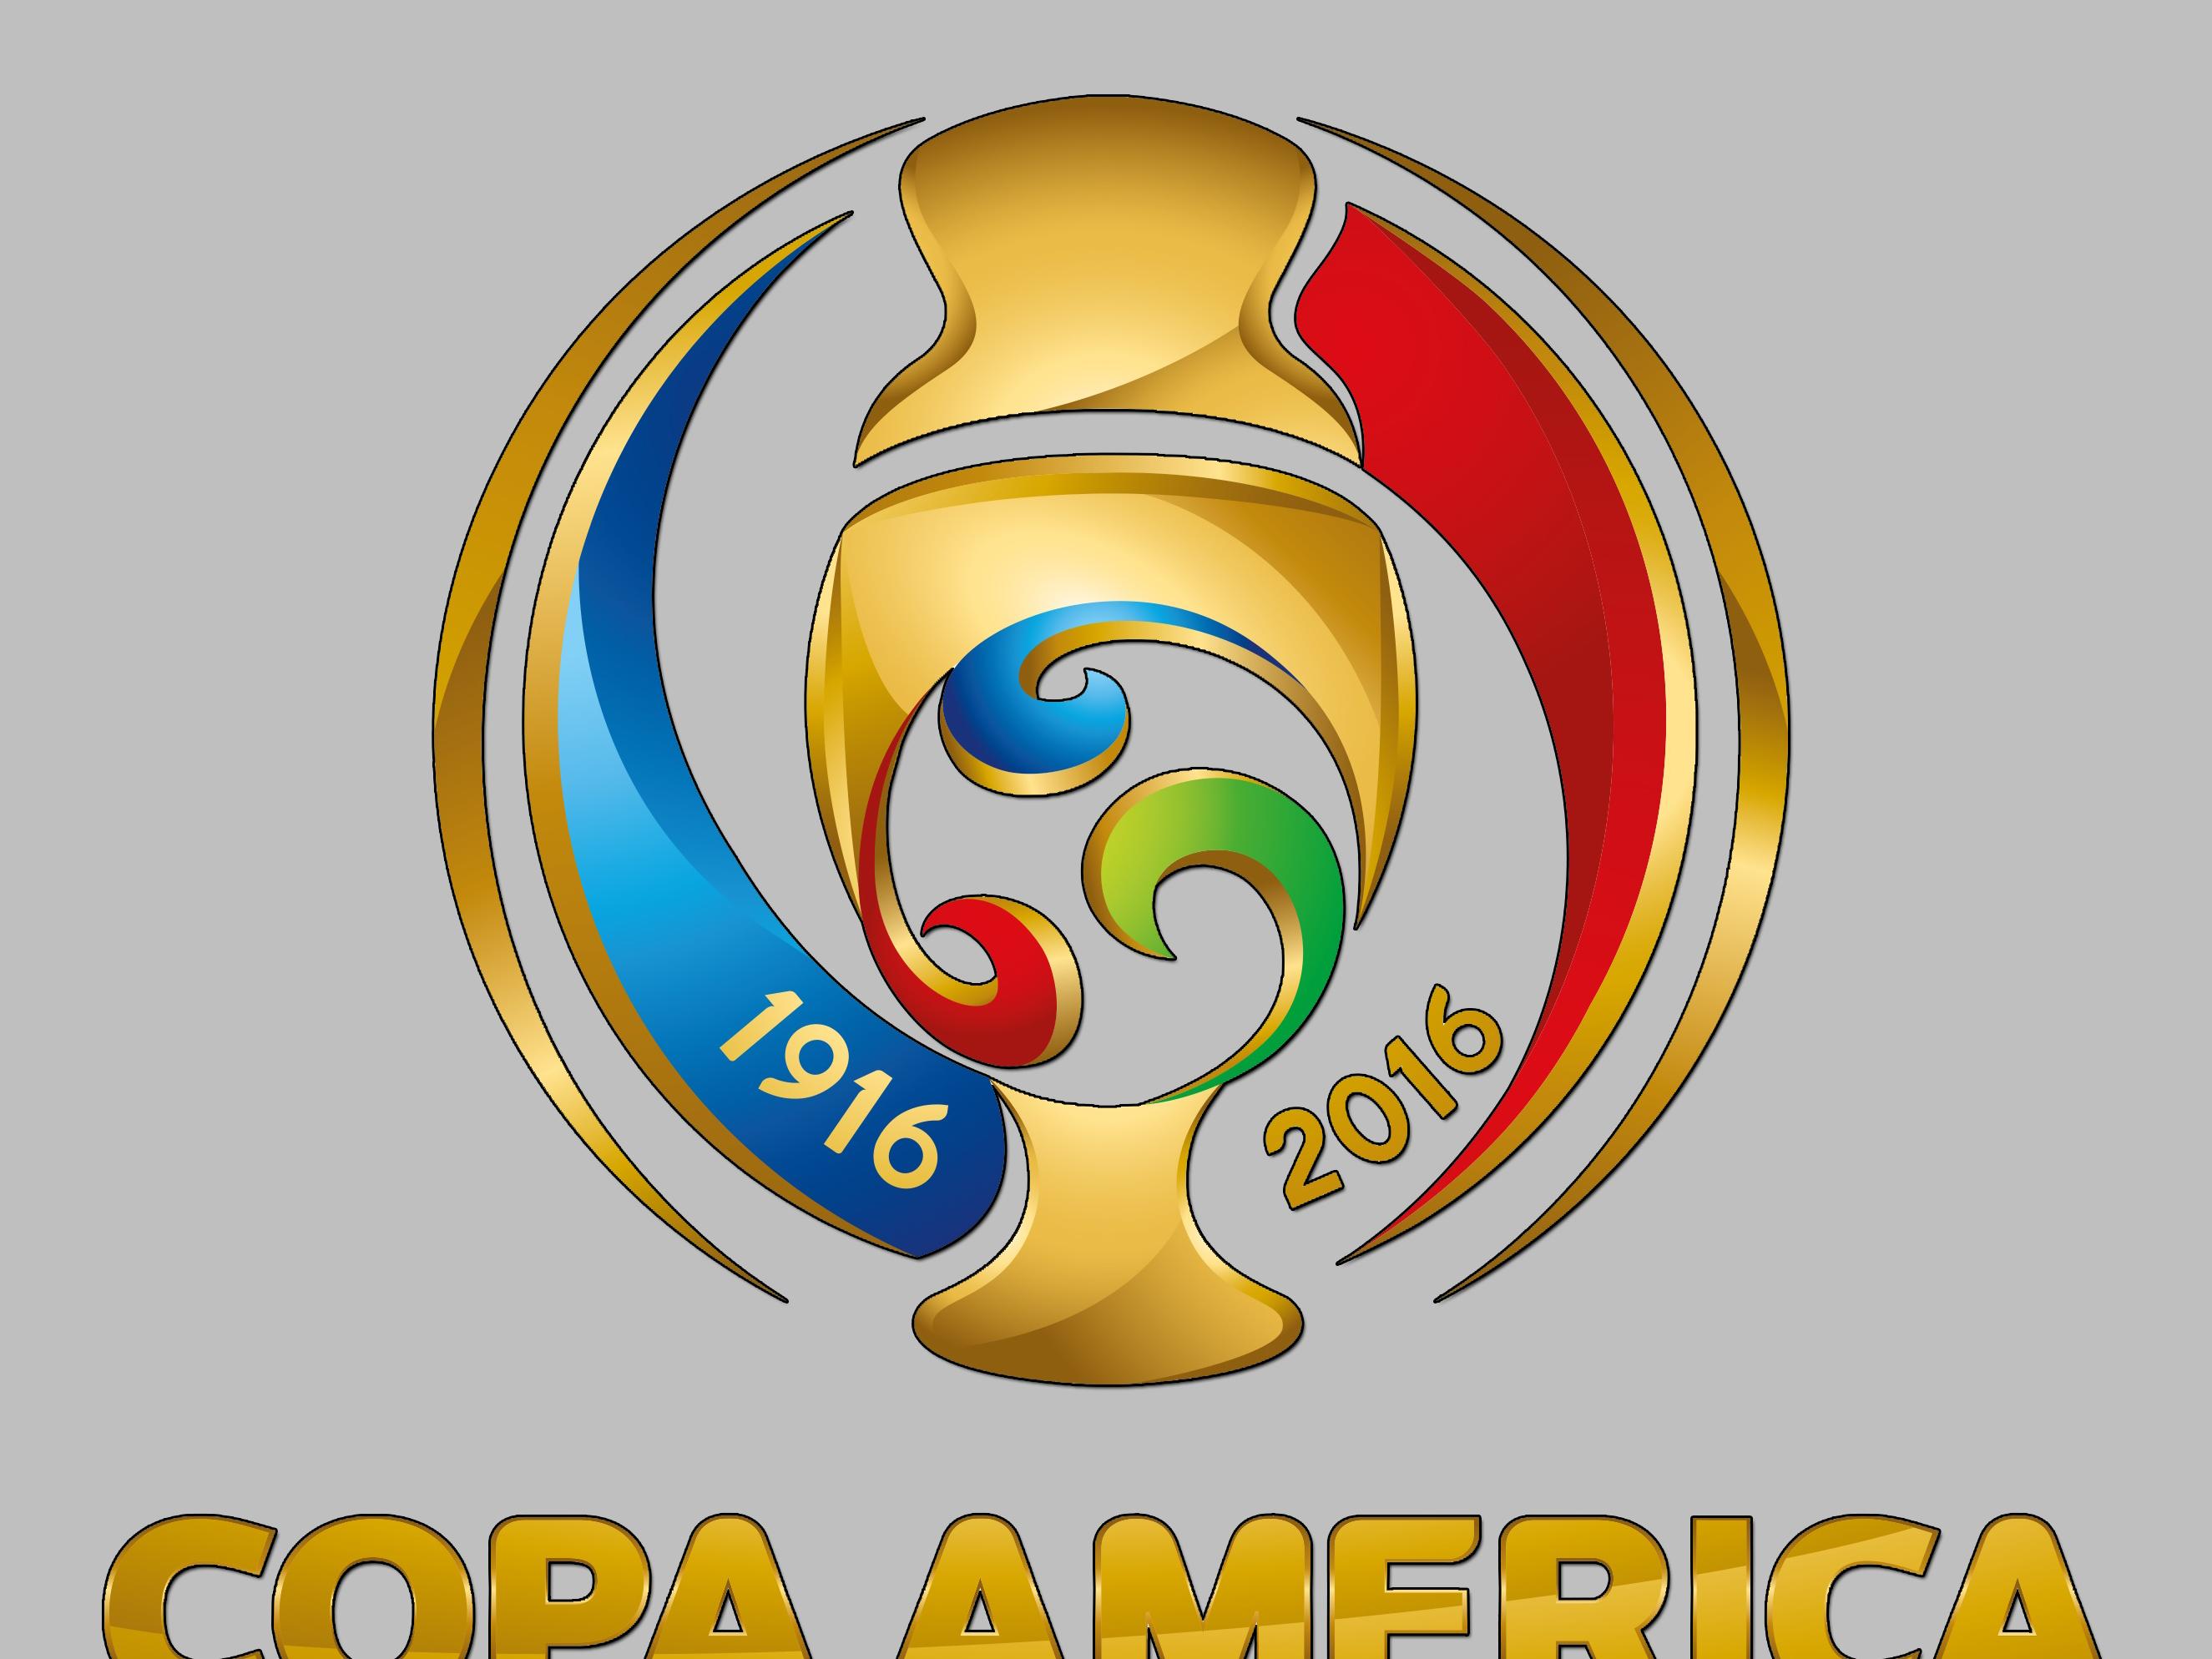 2016 Centennial Copa America Hdpng.com  - Copa America, Transparent background PNG HD thumbnail